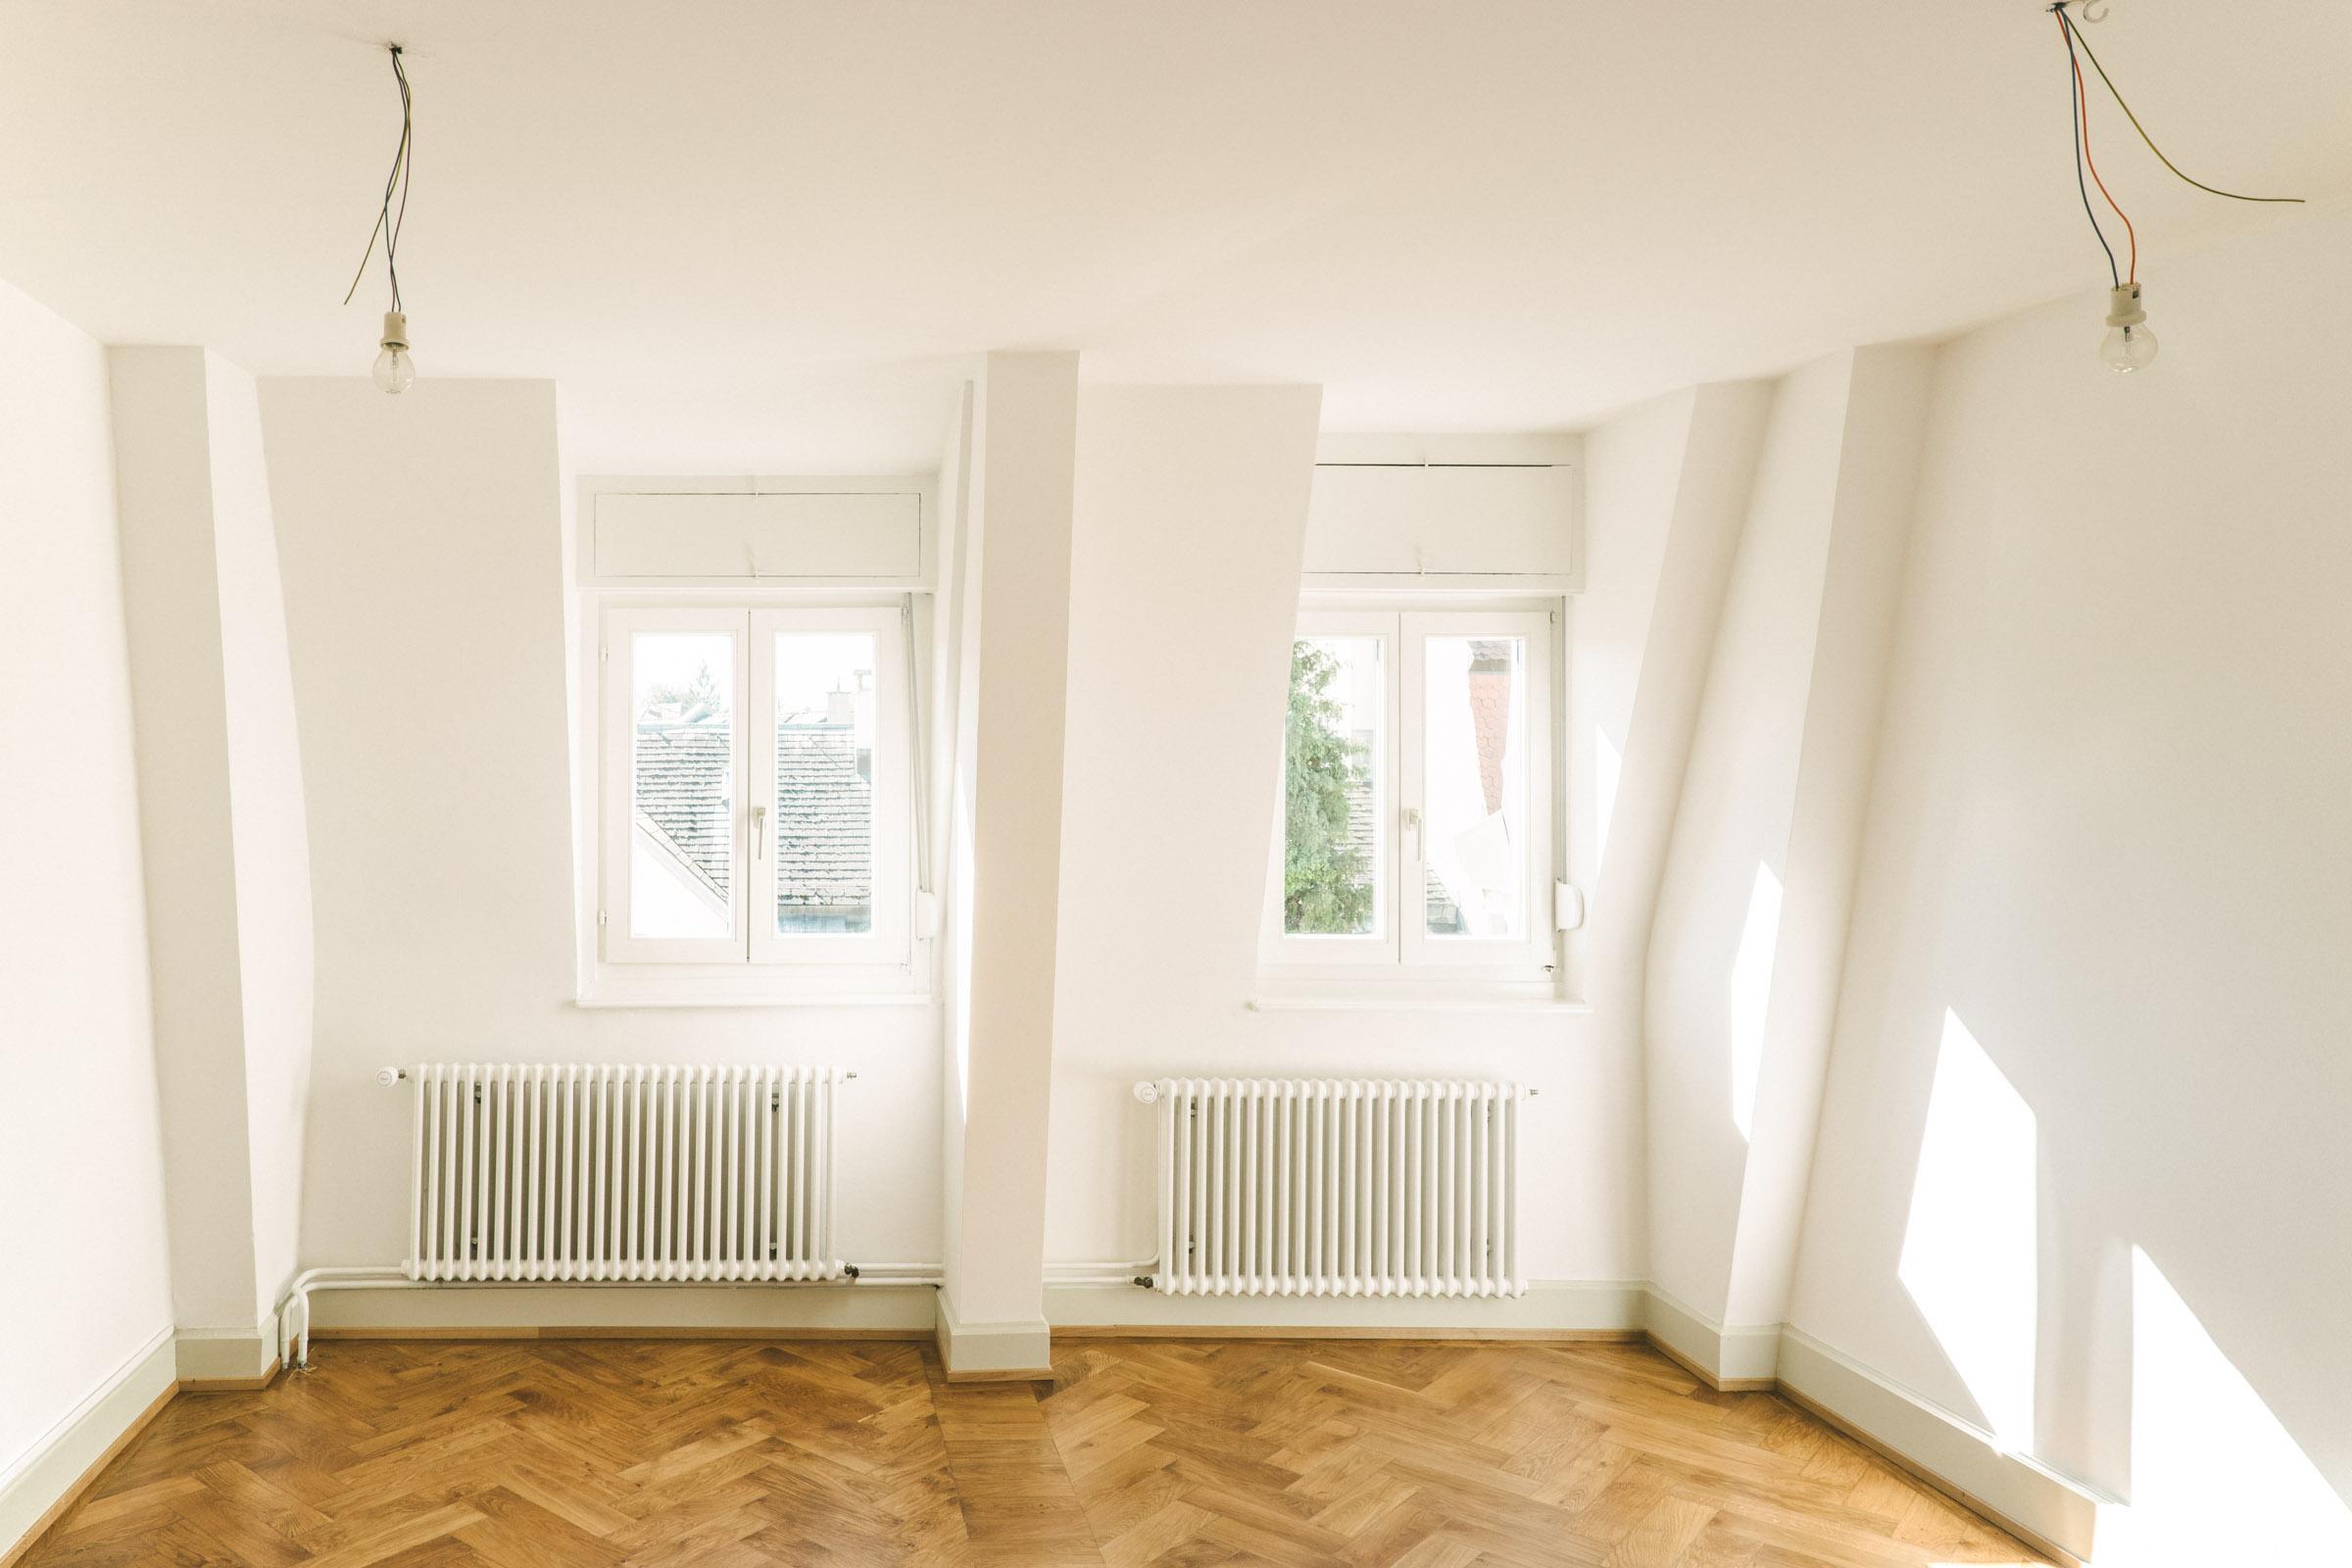 Umbau MFH Basel Fenster, Consilium Architektur und Baumanagement